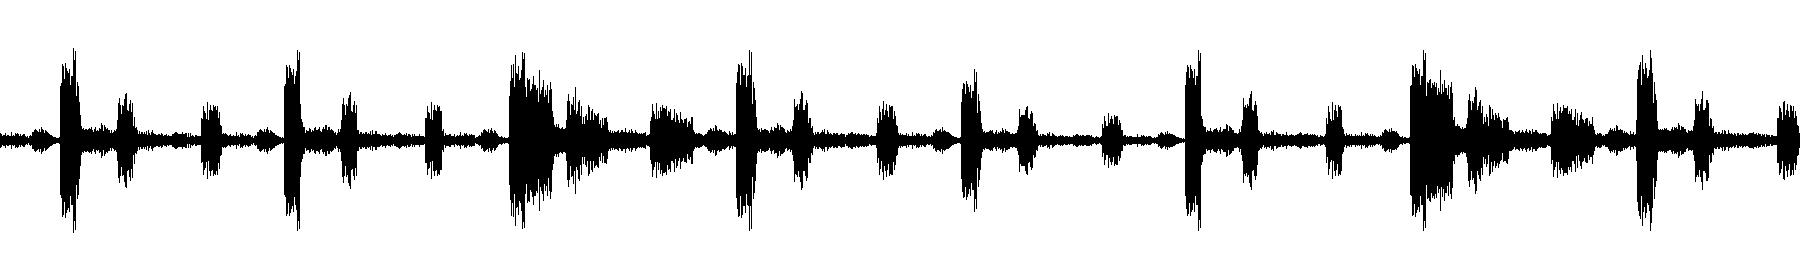 pth synth 01